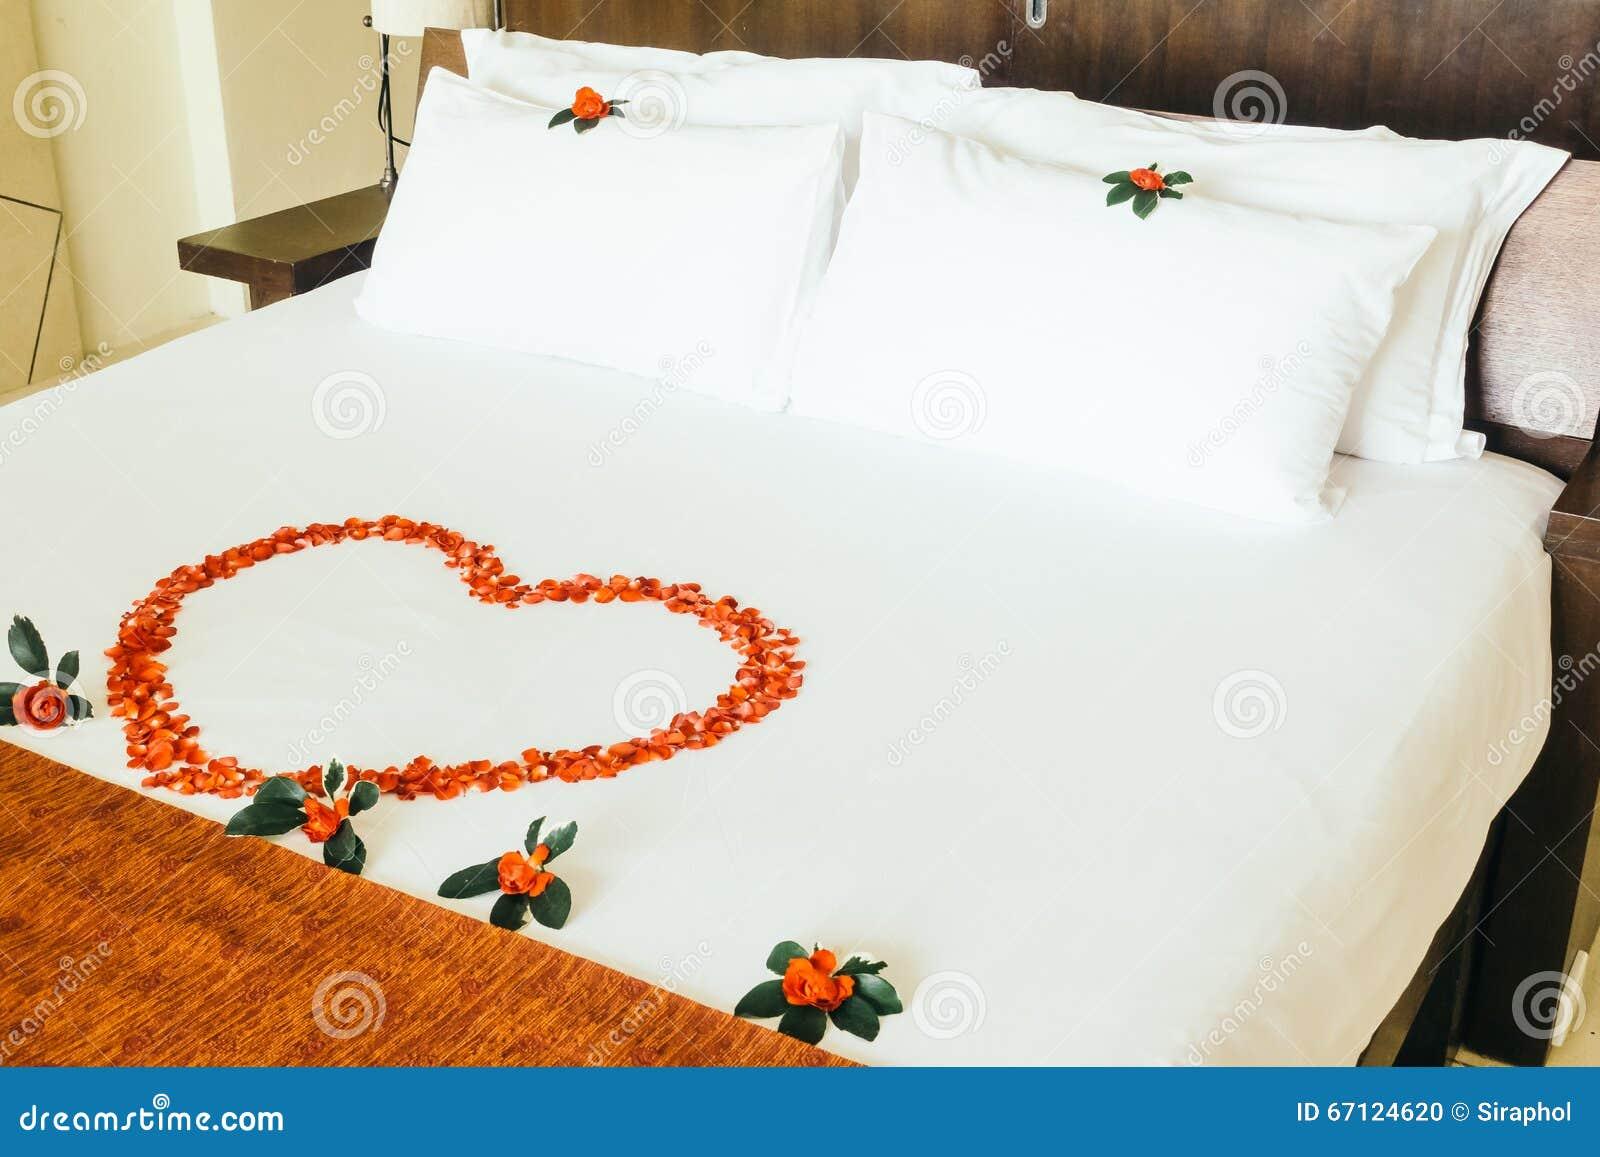 Honeymoon bed stock photo. Image of room, swan, hotel - 67124620